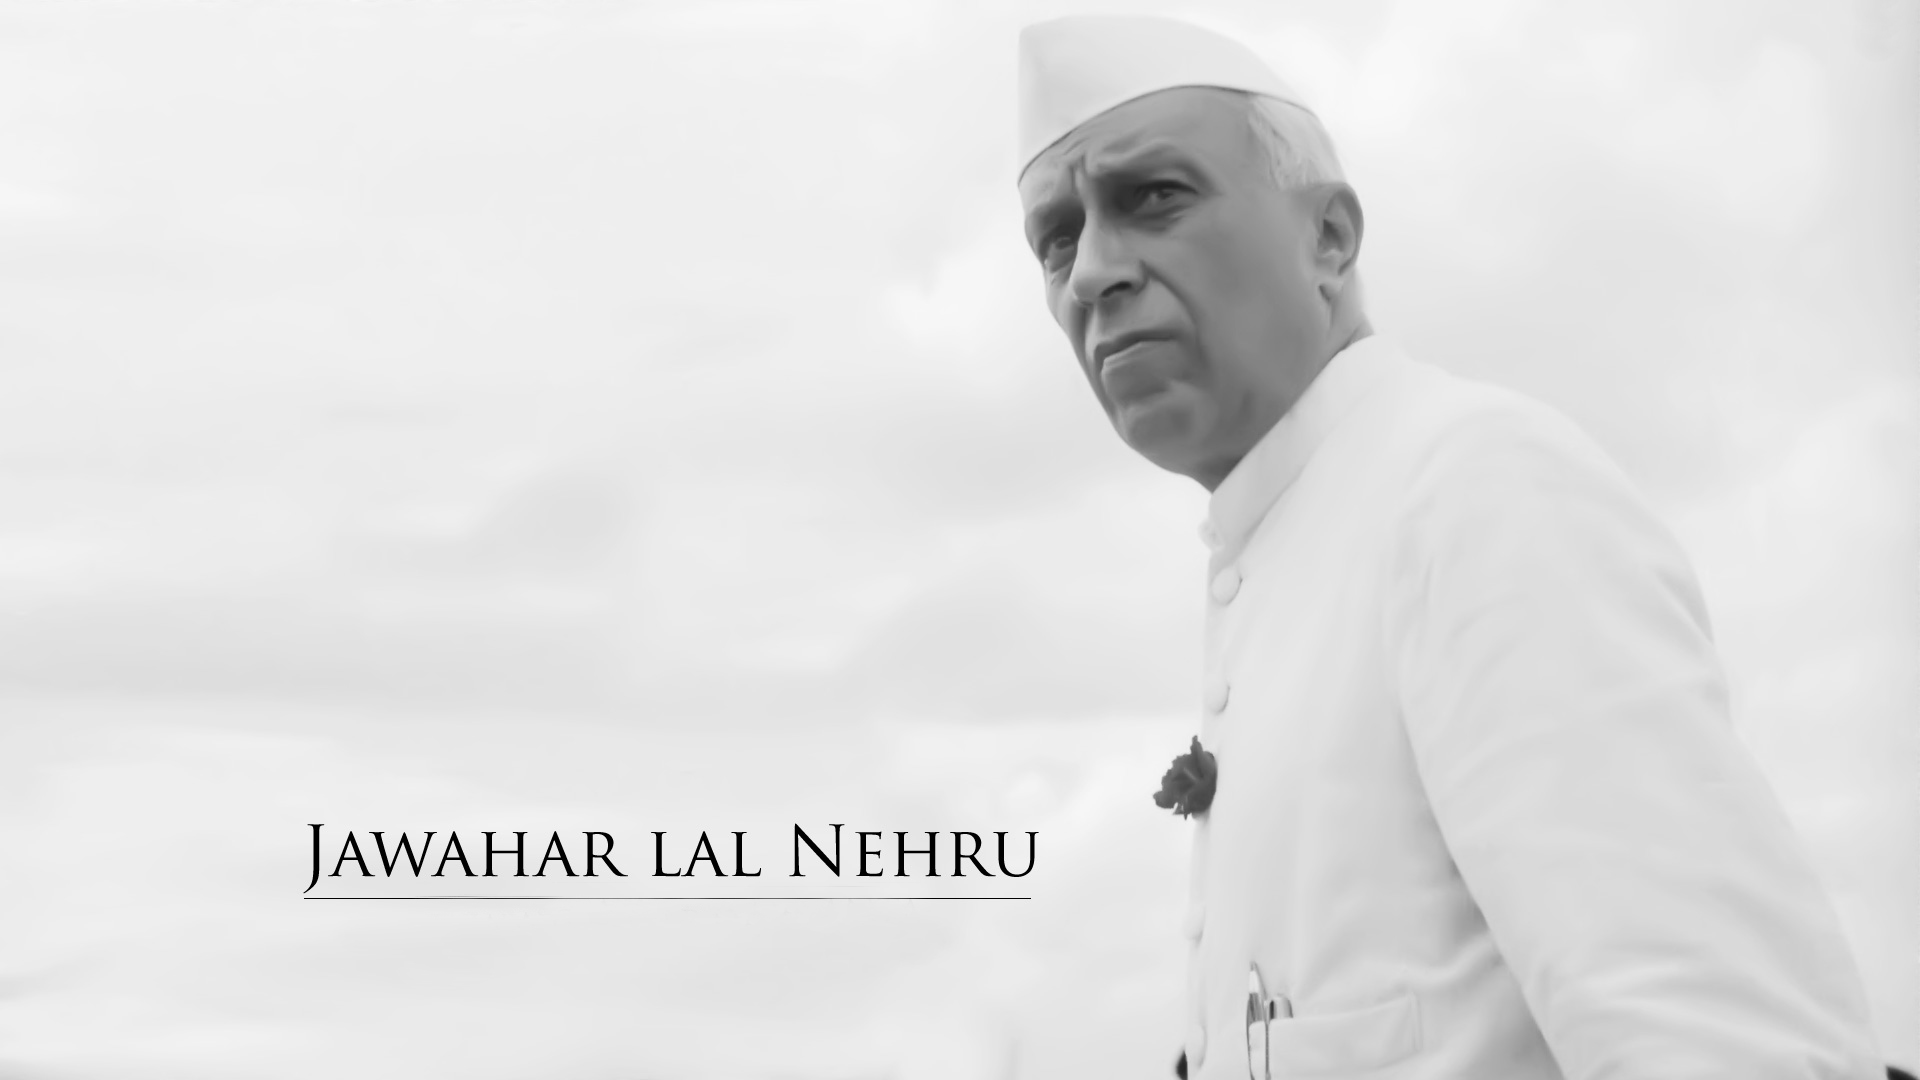 jawahar-lal-nehru